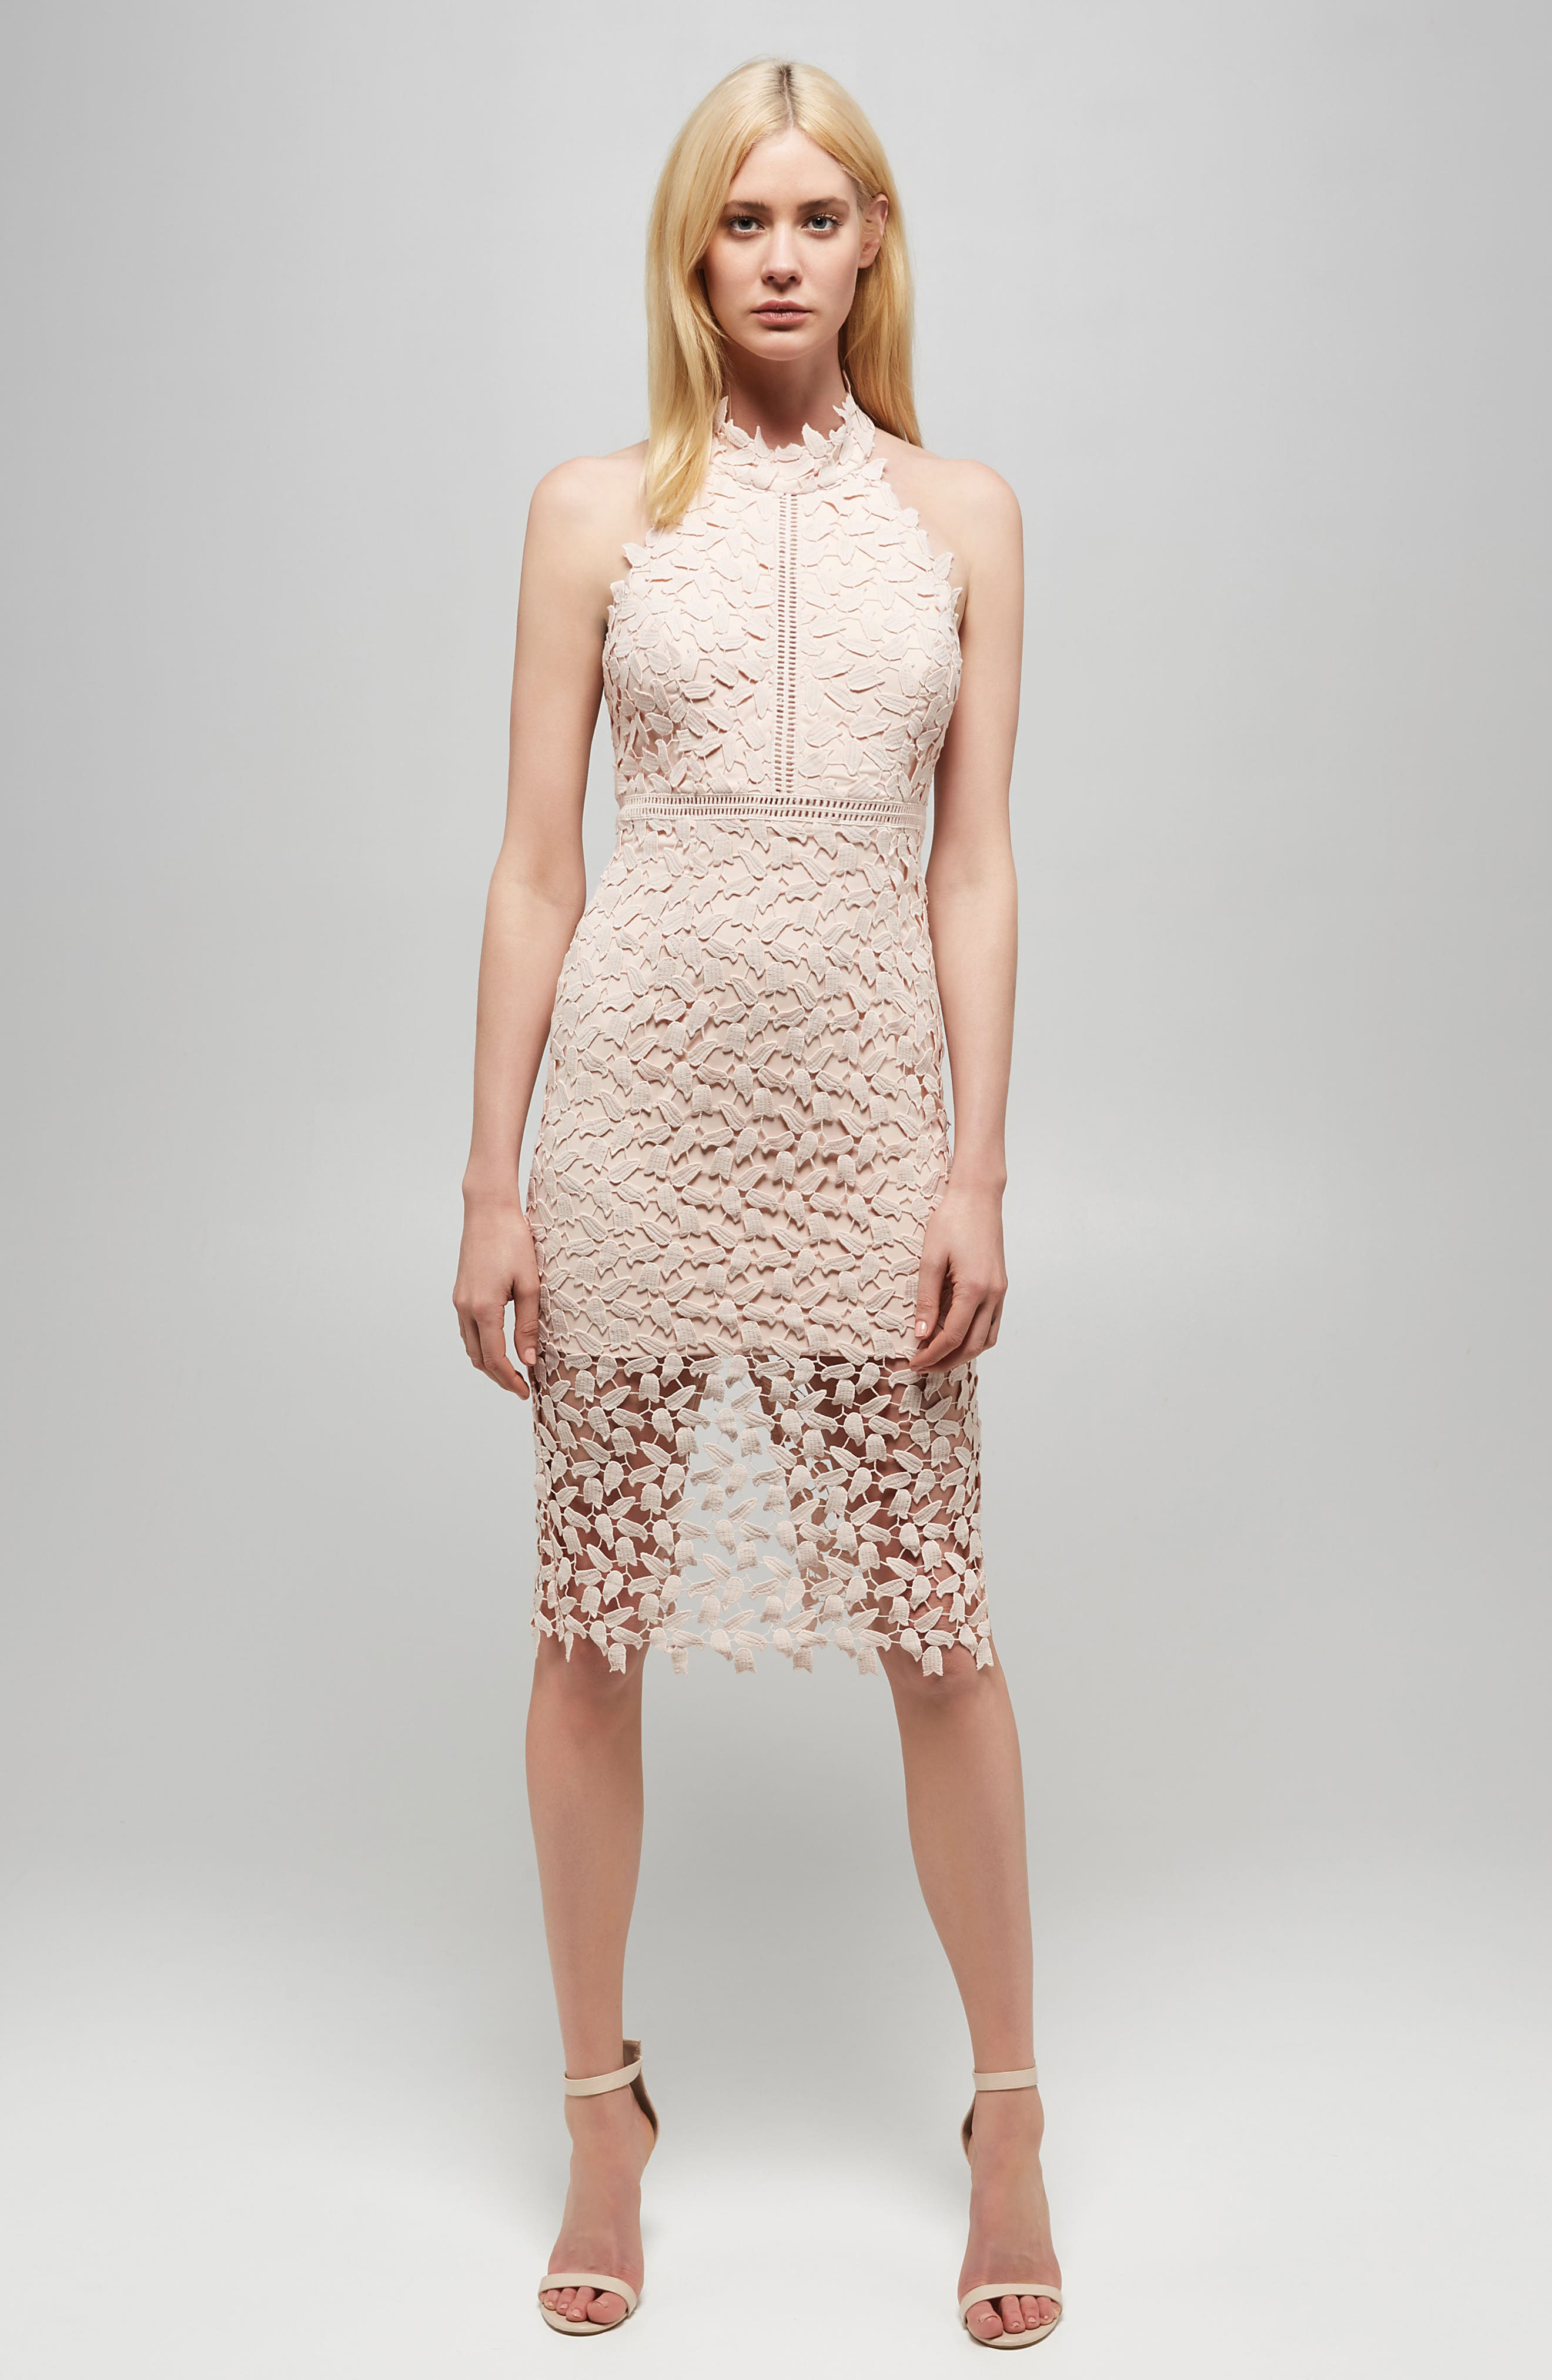 BARDOT, Gemma Halter Lace Sheath Dress, Alternate thumbnail 8, color, PROSECCO